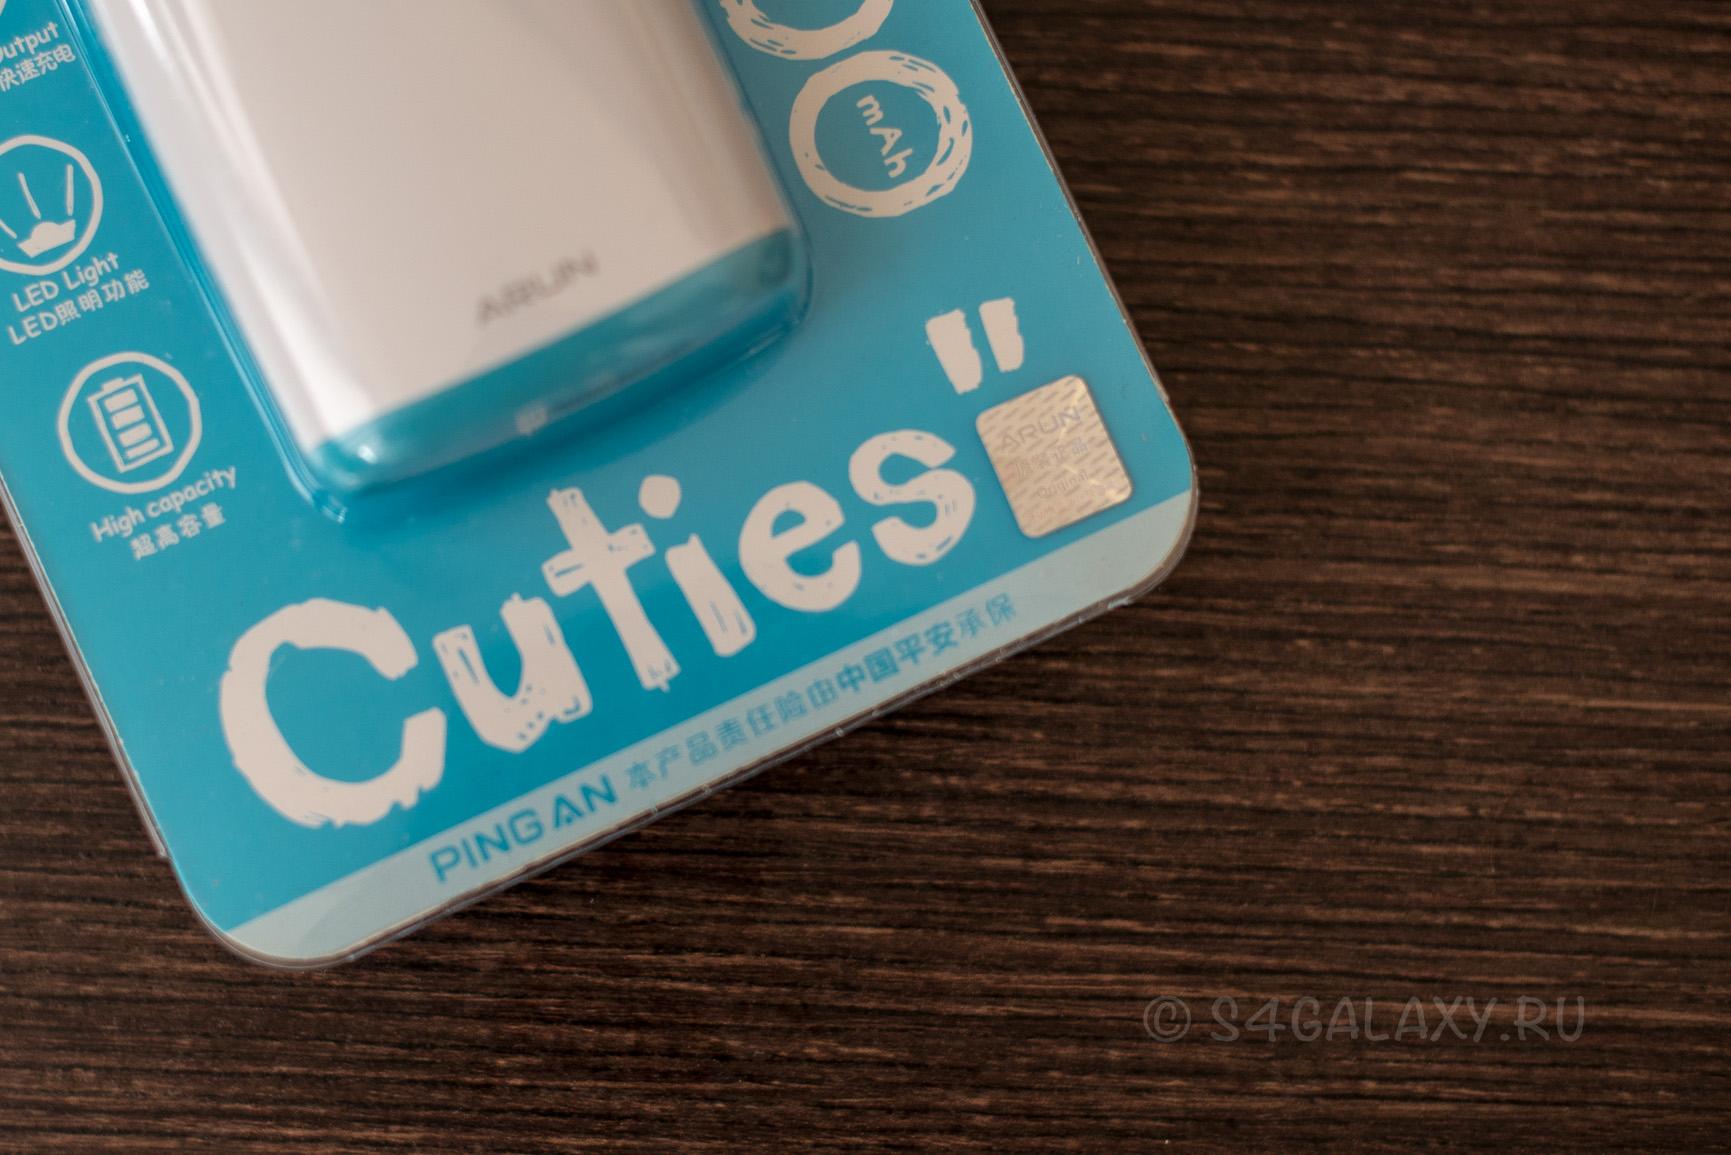 Батарея на Galaxy S5 S4 Note 3